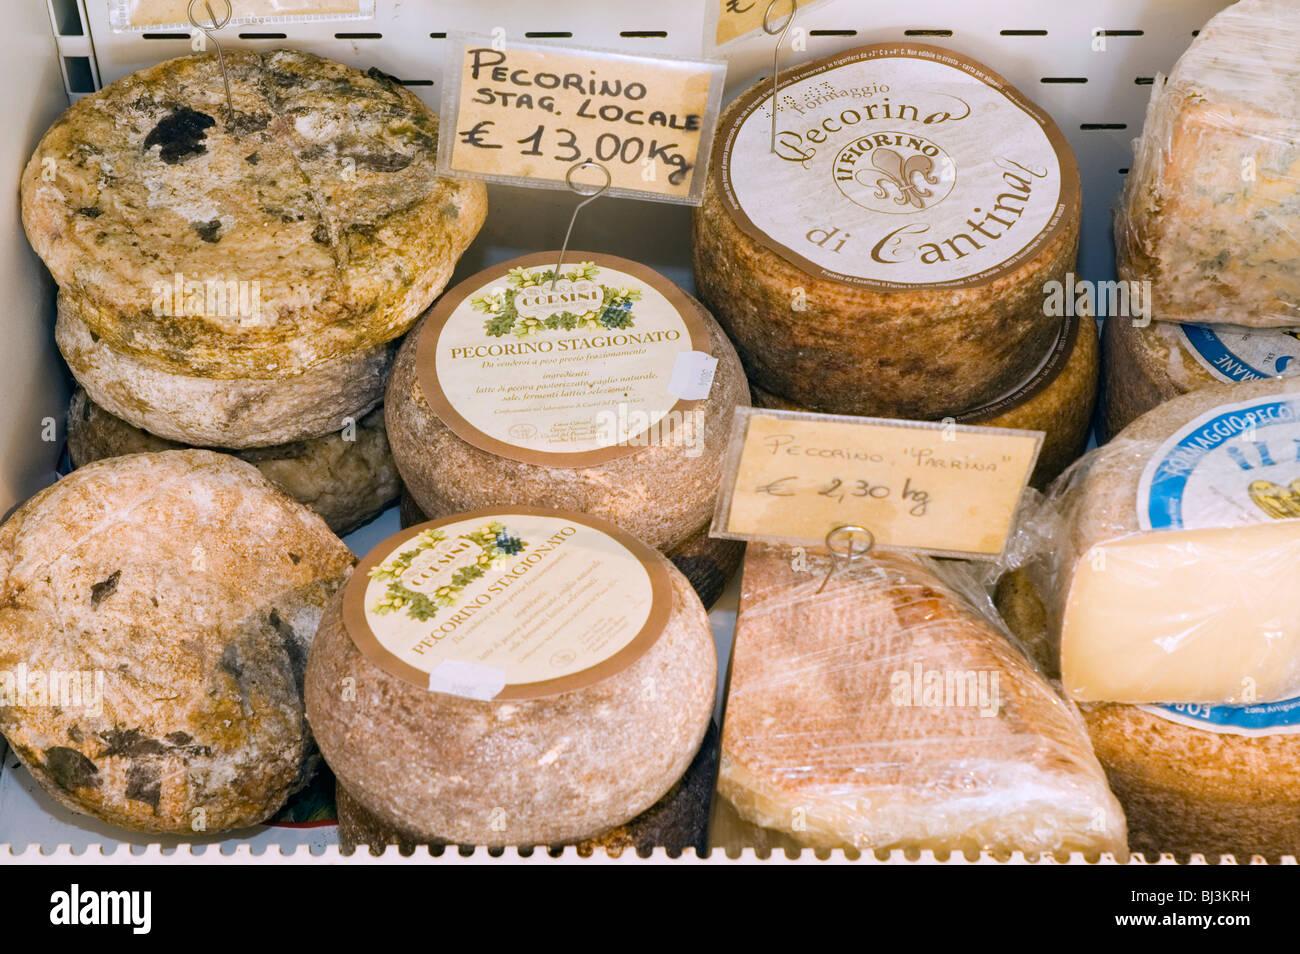 Pecorino cheese, Casa Corsini, deli, Castel del Piano, Tuscany, Italy, Europe Stock Photo